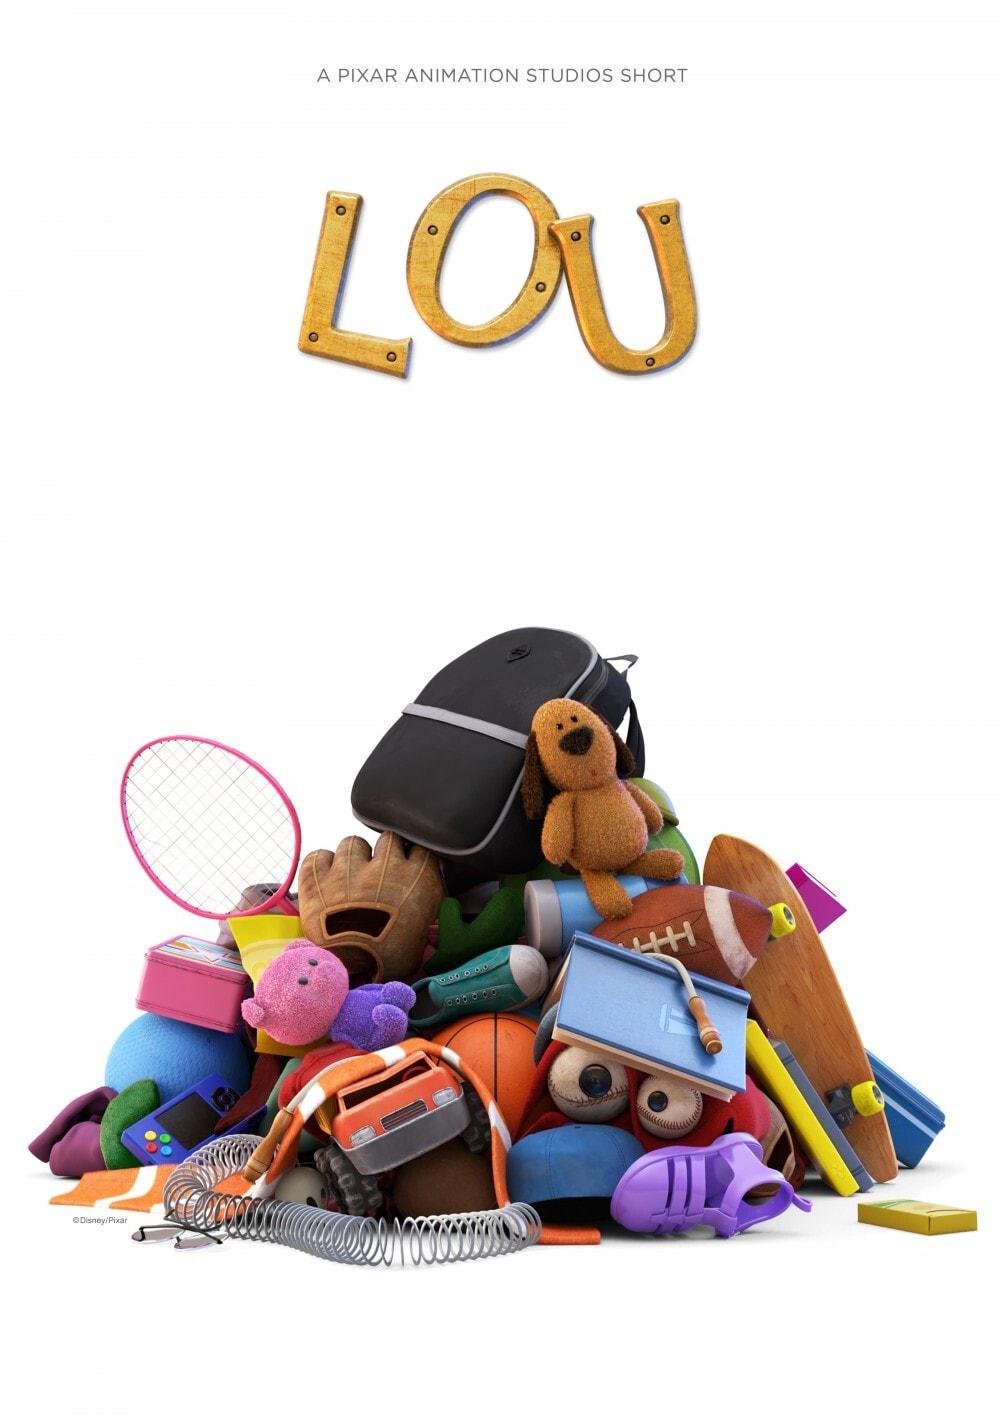 Lou Disney • Pixar Animated Short